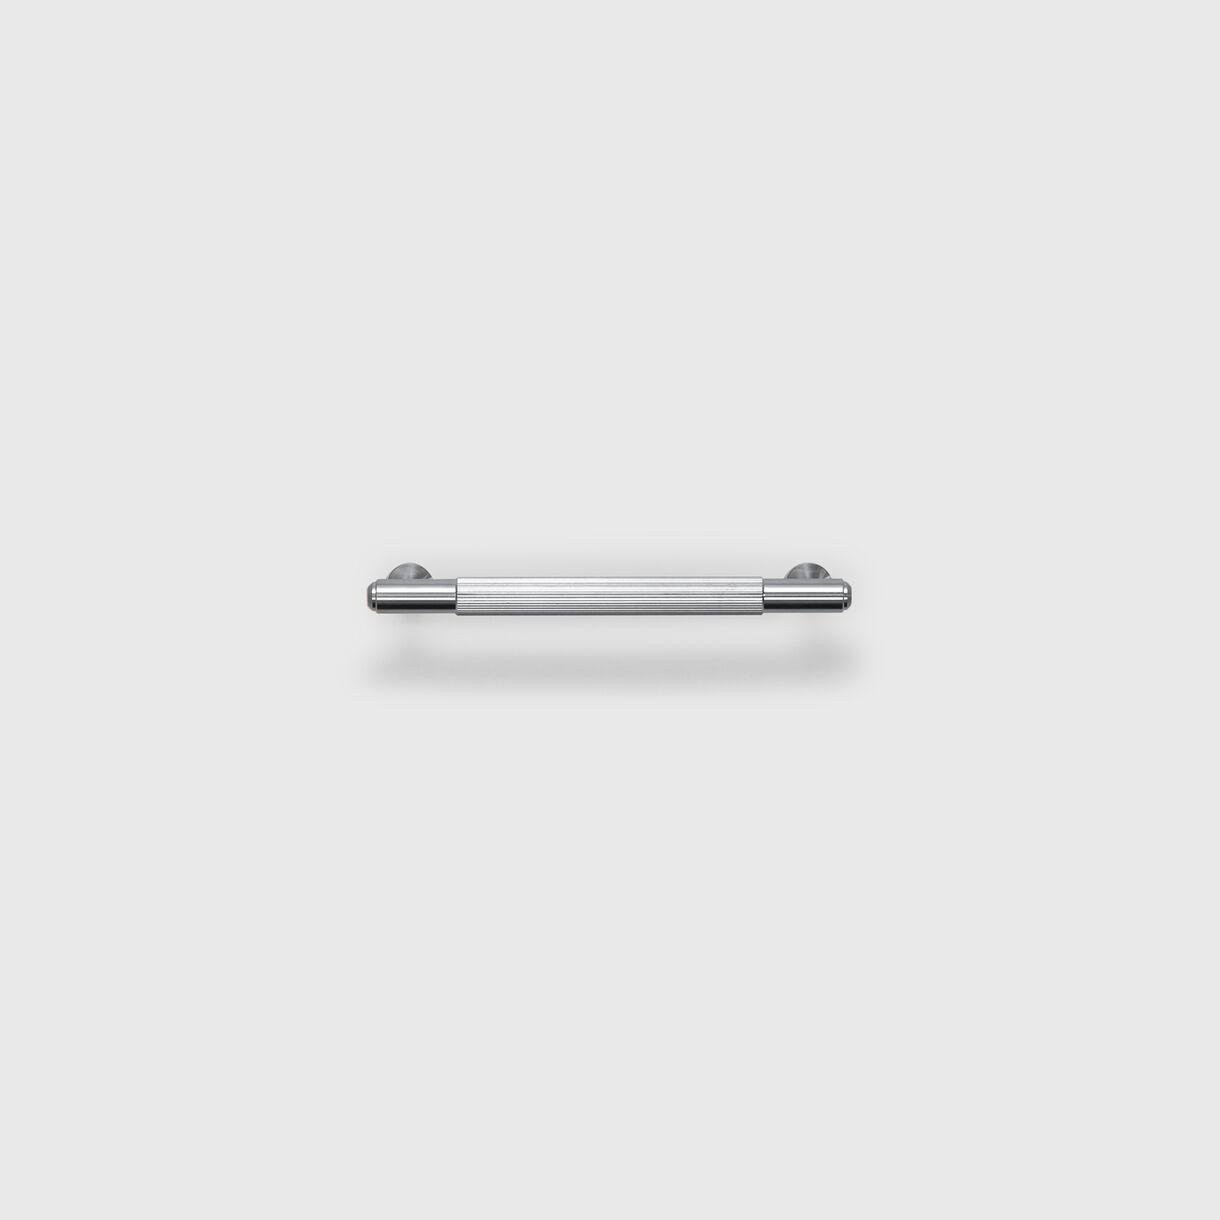 Linear Pull Bar